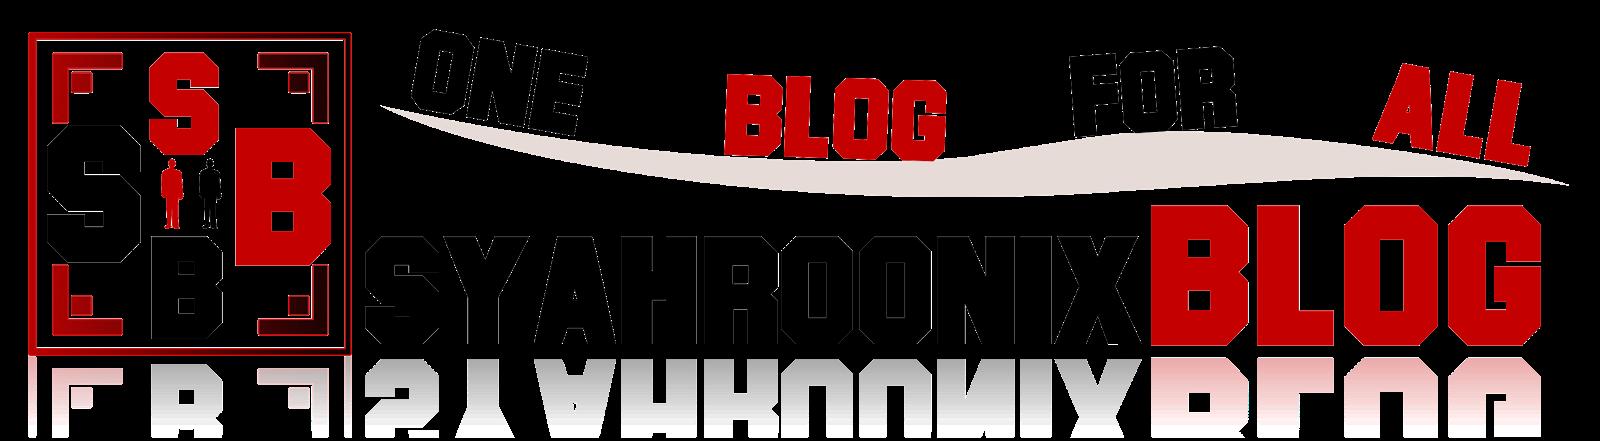 Syahroonix Blog - One Blog For All Banner